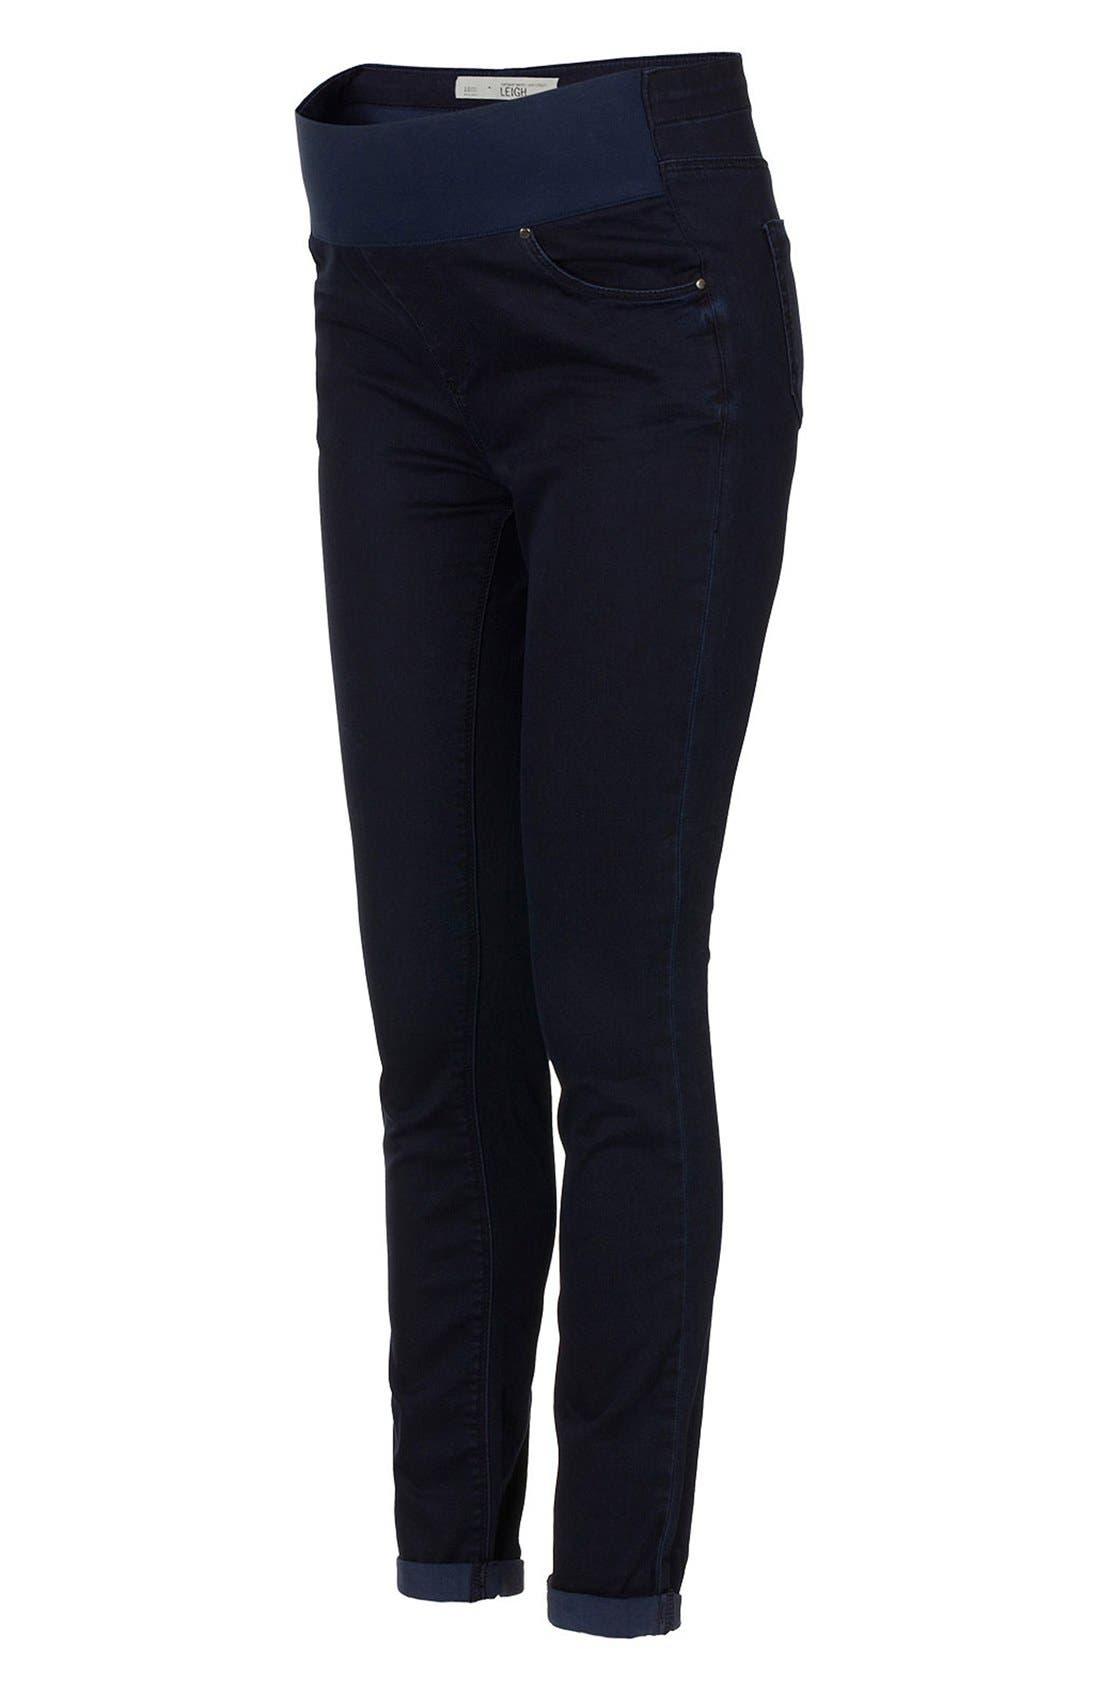 Main Image - Topshop Moto 'Leigh' Maternity Jeans (Indigo)